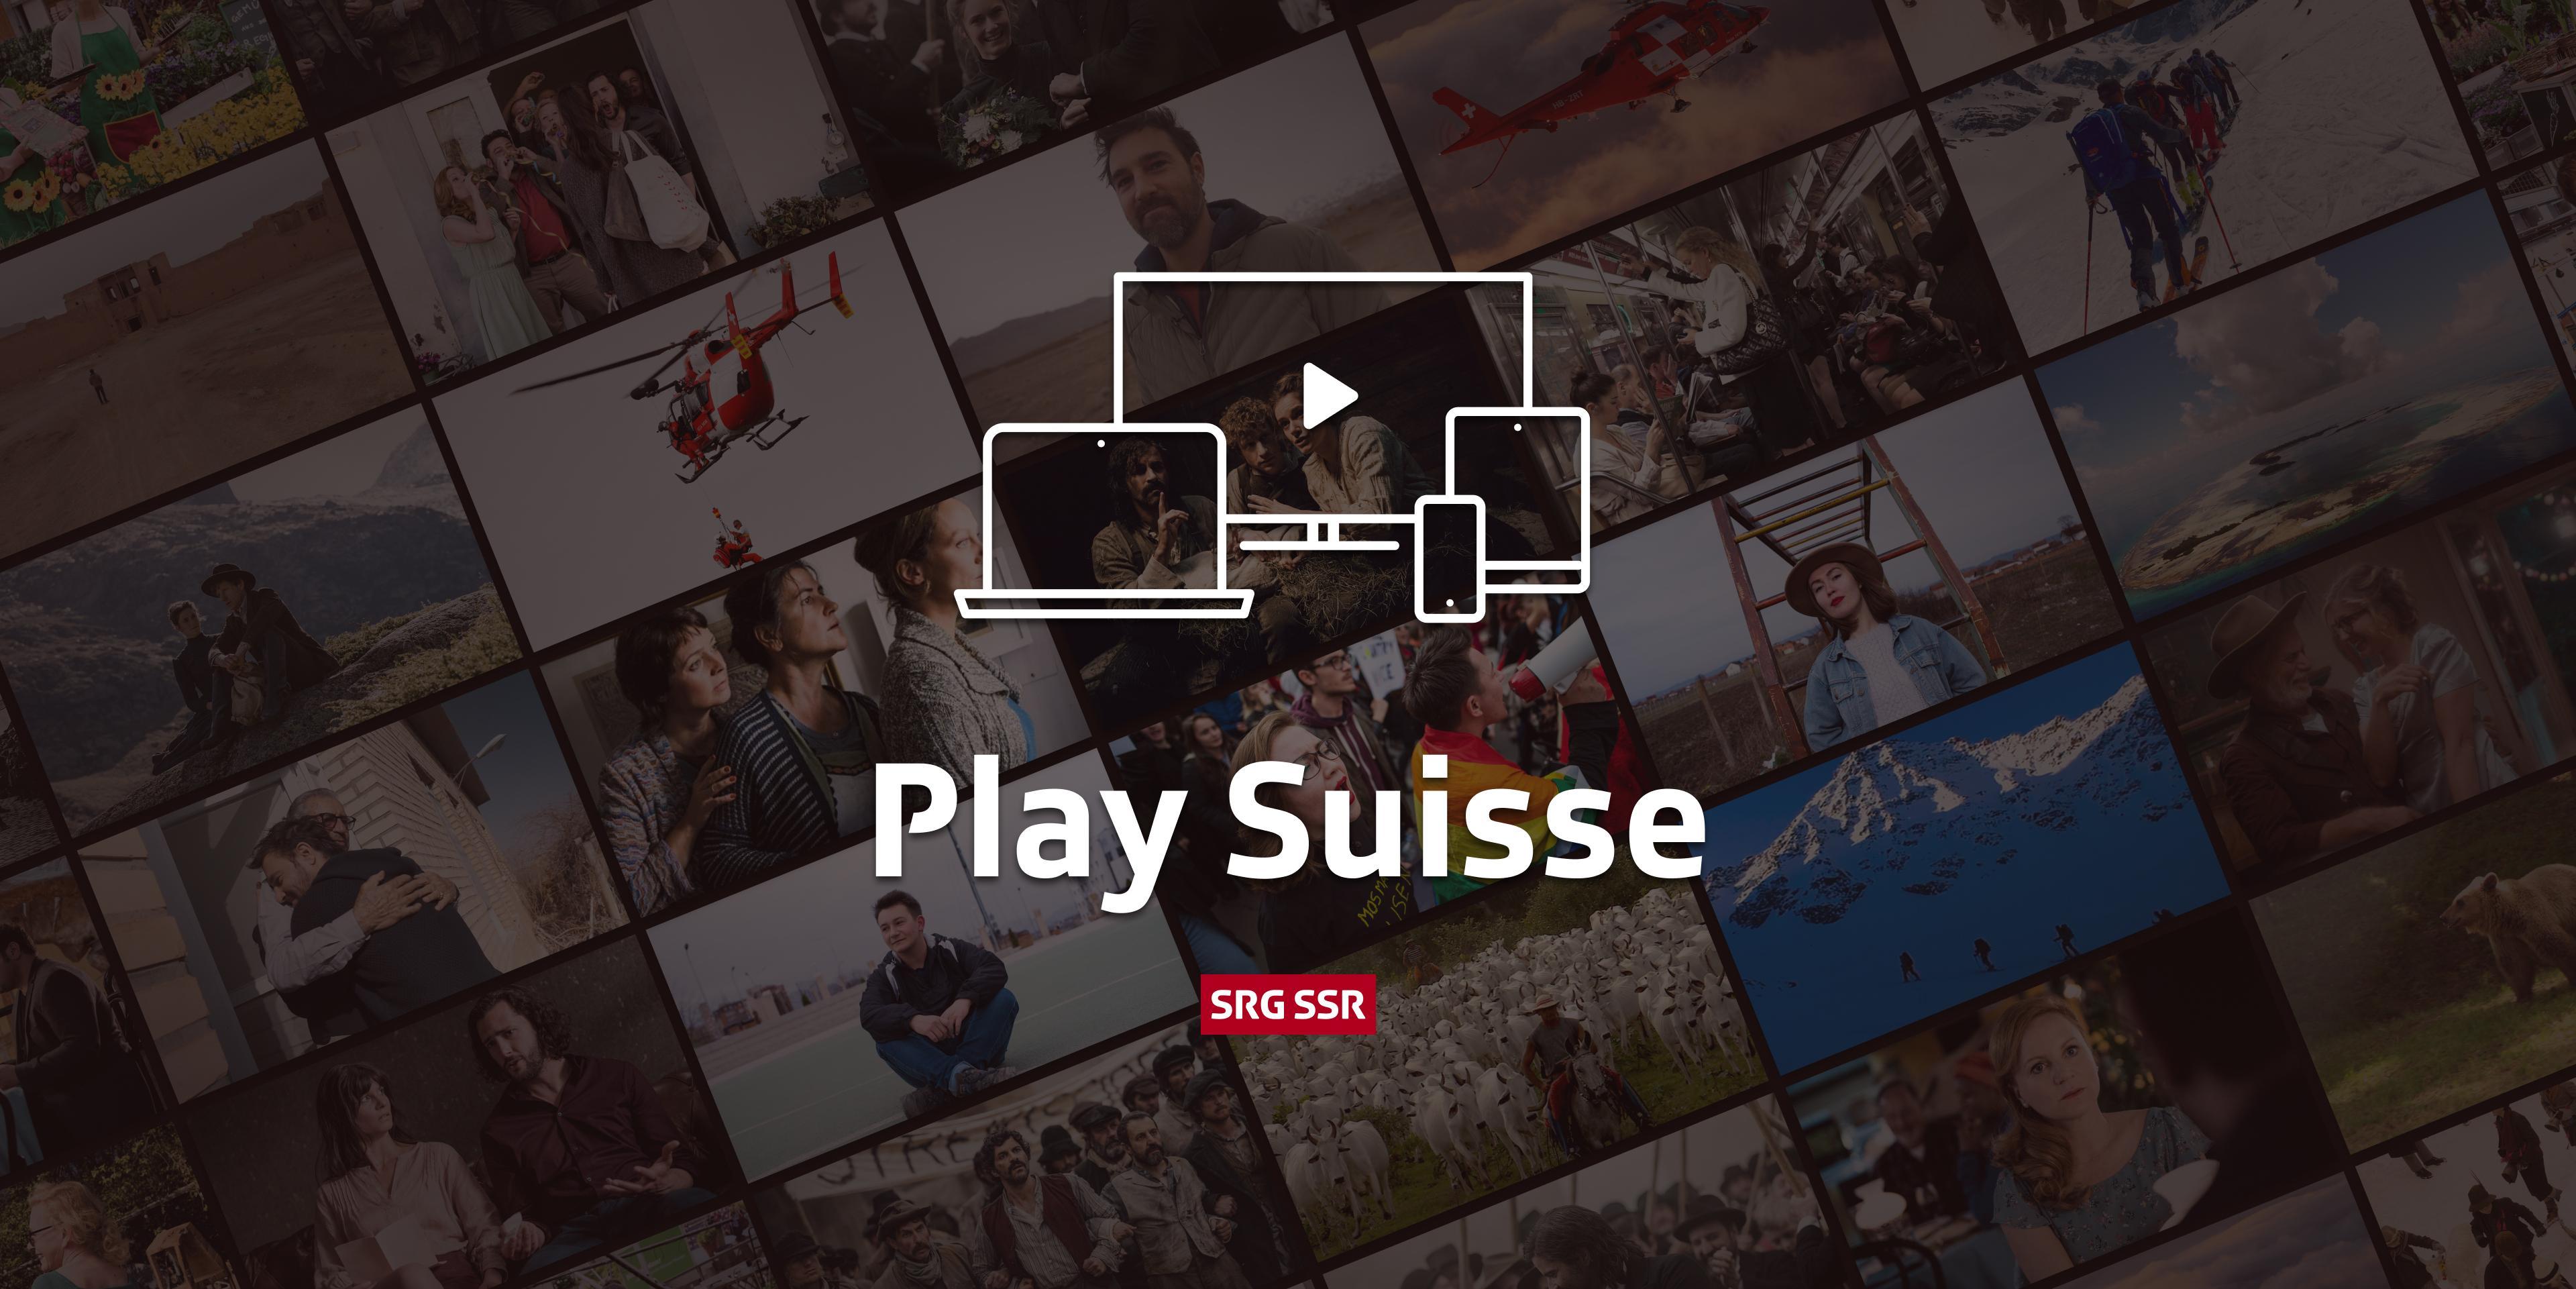 csm_PlaySuisse_Comm_v2_ad0b59301e